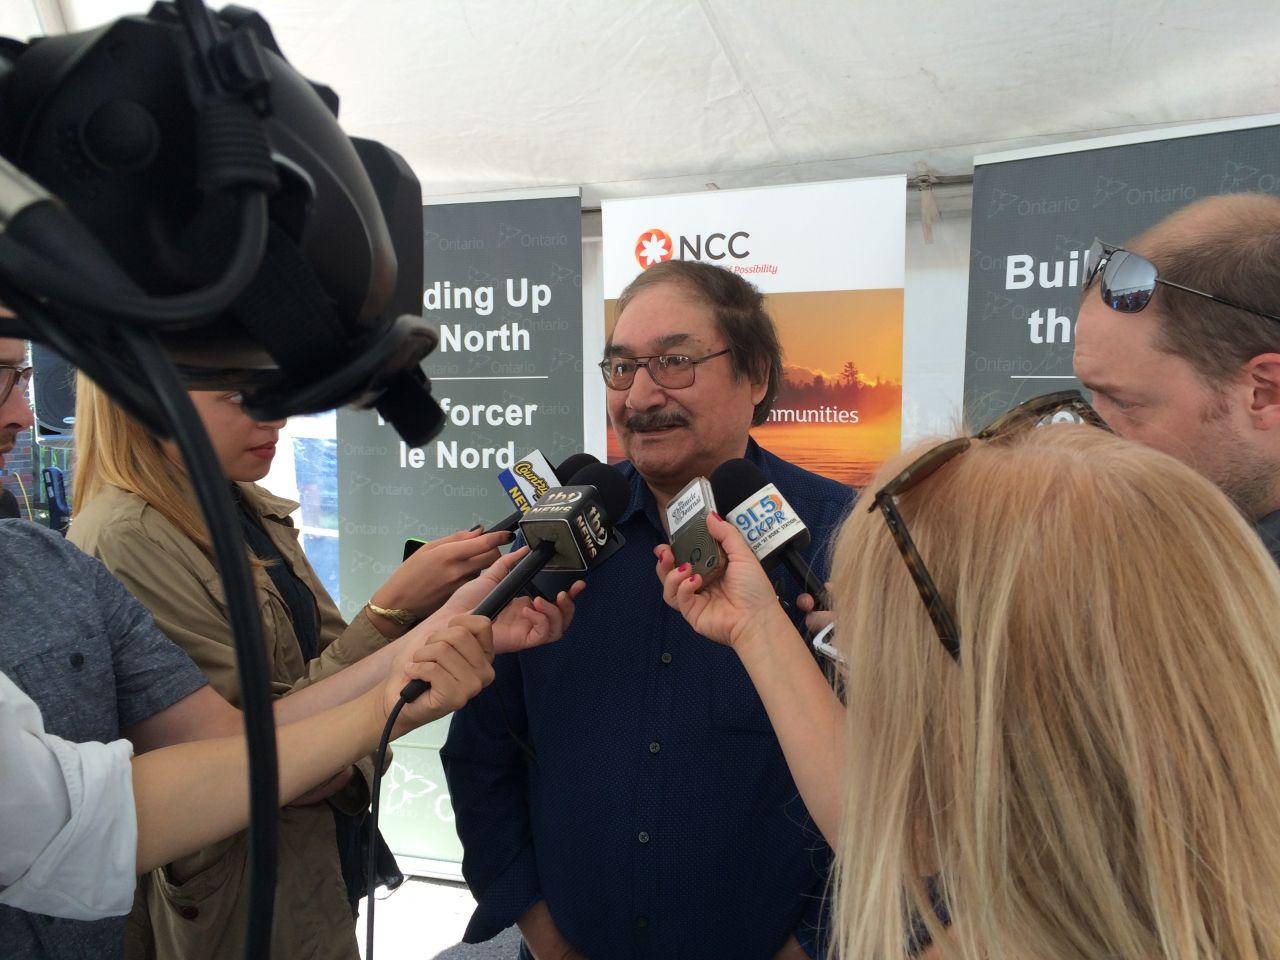 Chief Joseph Crowe talks to the media